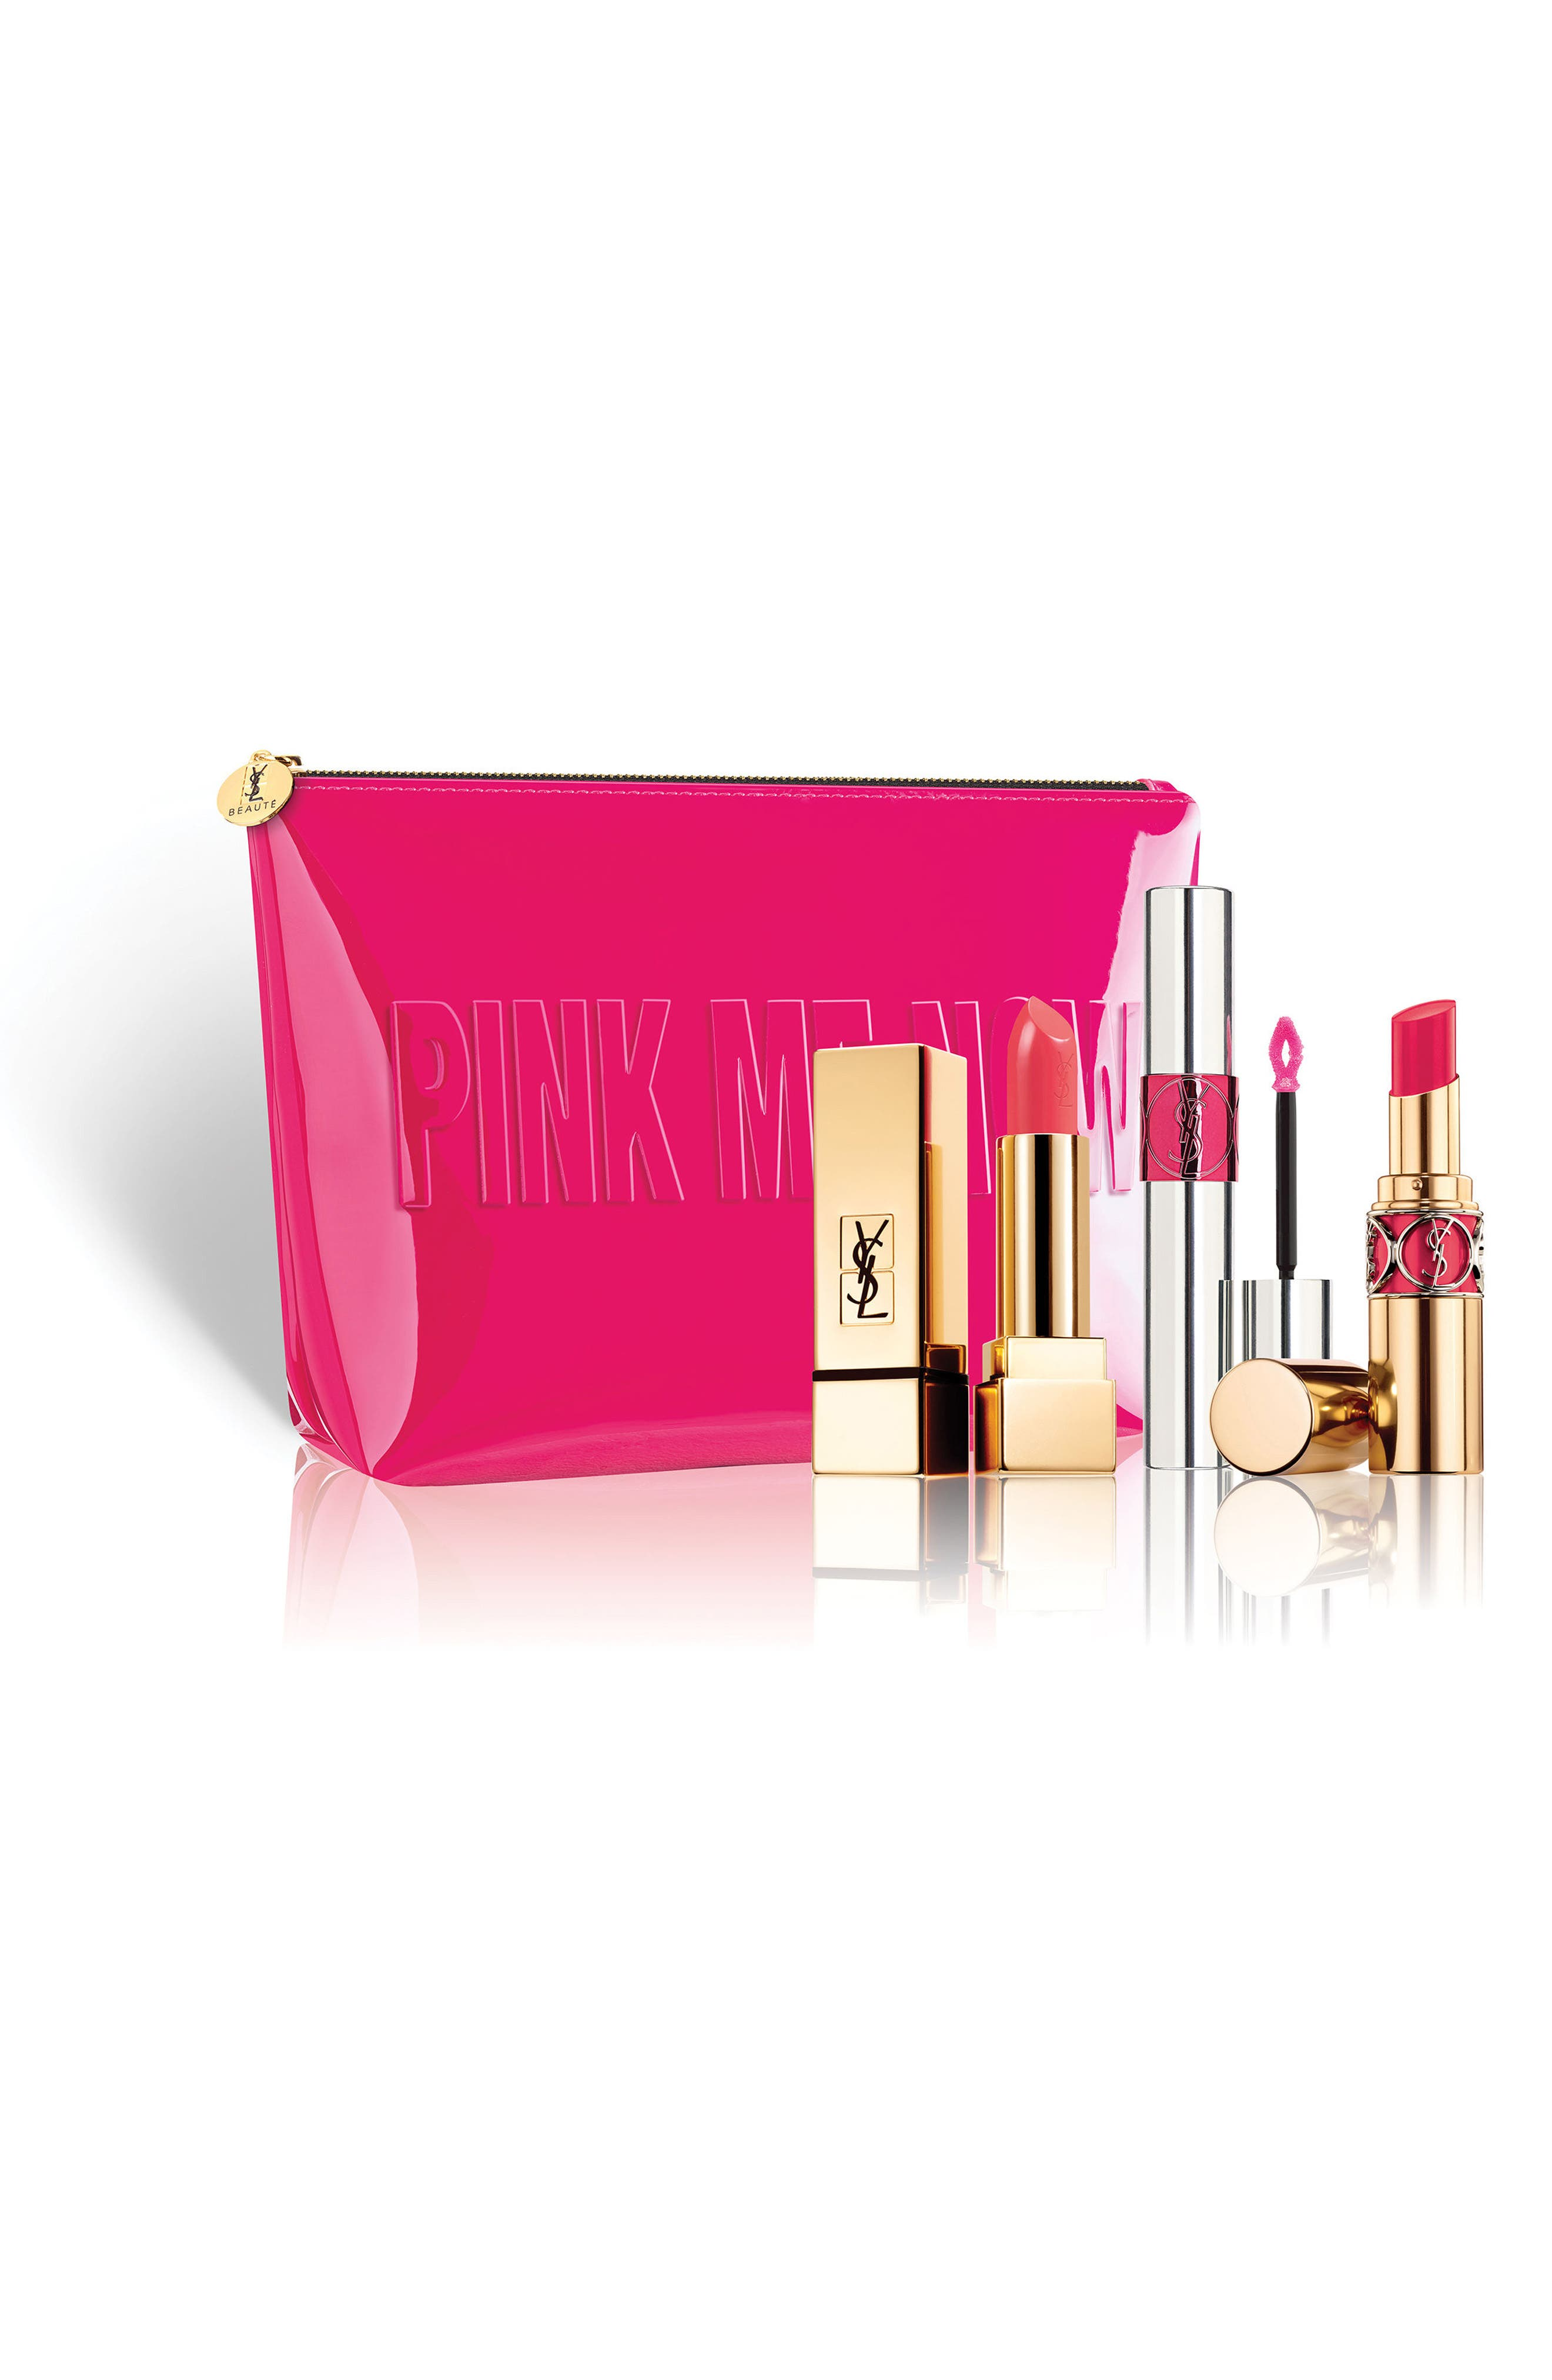 Yves Saint Laurent Lip Set ($106 Value)